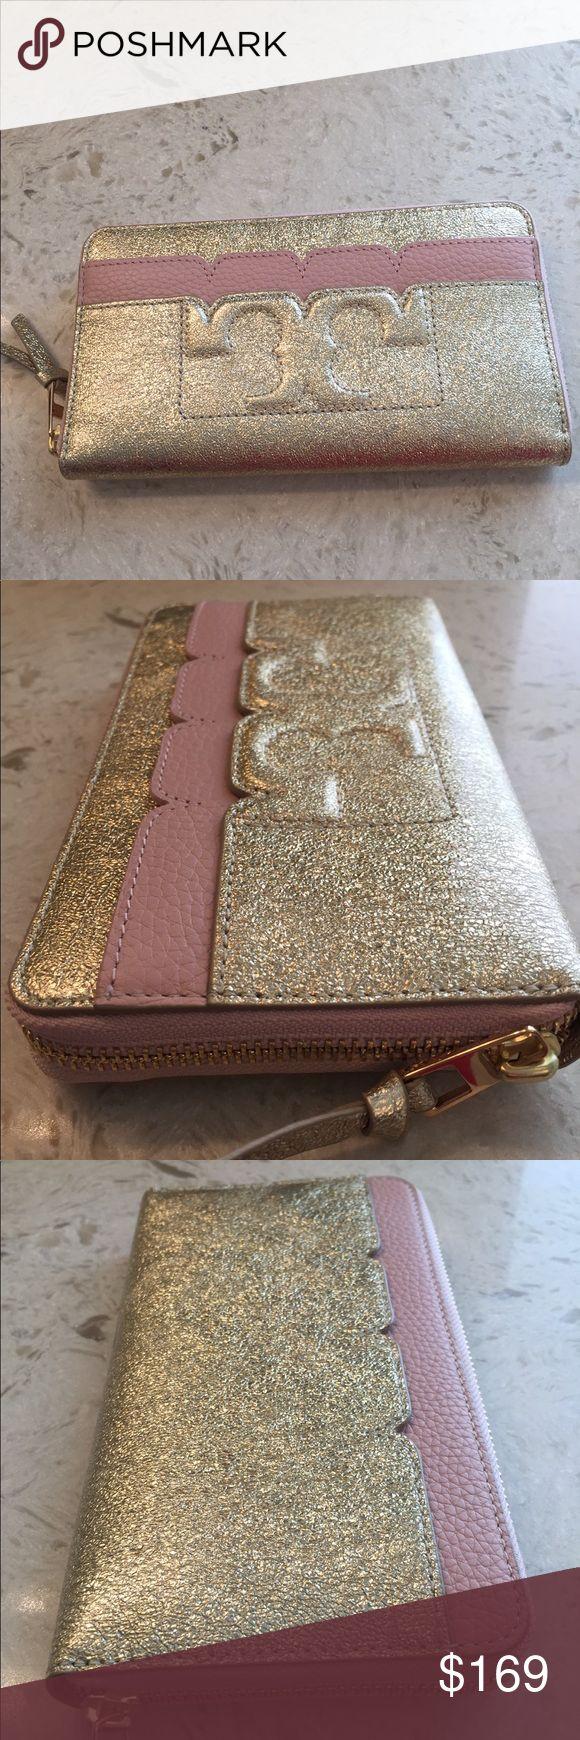 🆕Tory Burch Scallop-T Metallic Wallet Gold/Pink Beautiful Tory Burch Scallop-…